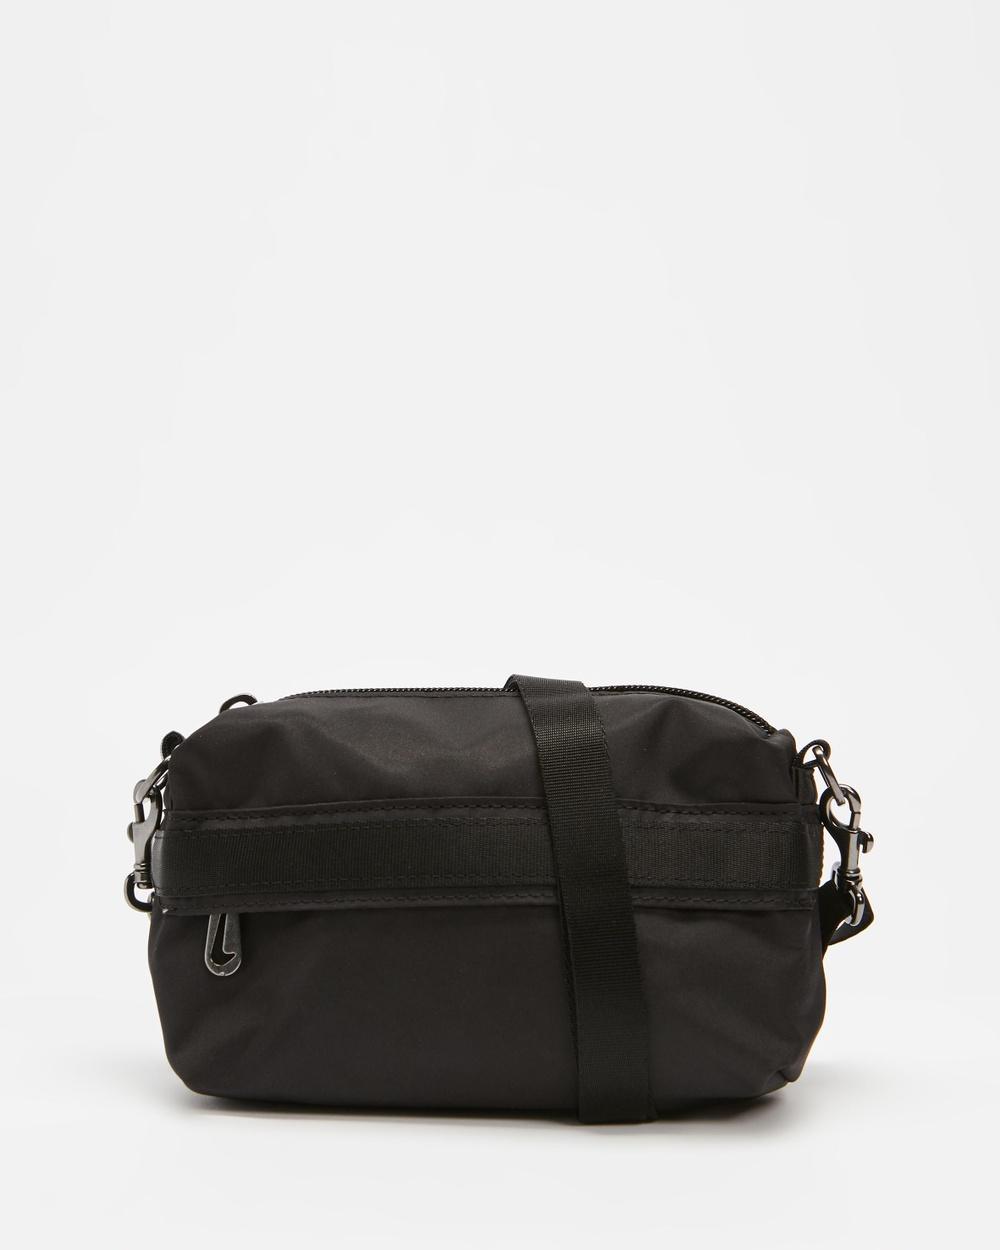 Nike Futura Luxe Crossbody Bum Bags Black, Black & Dark Smoke Grey